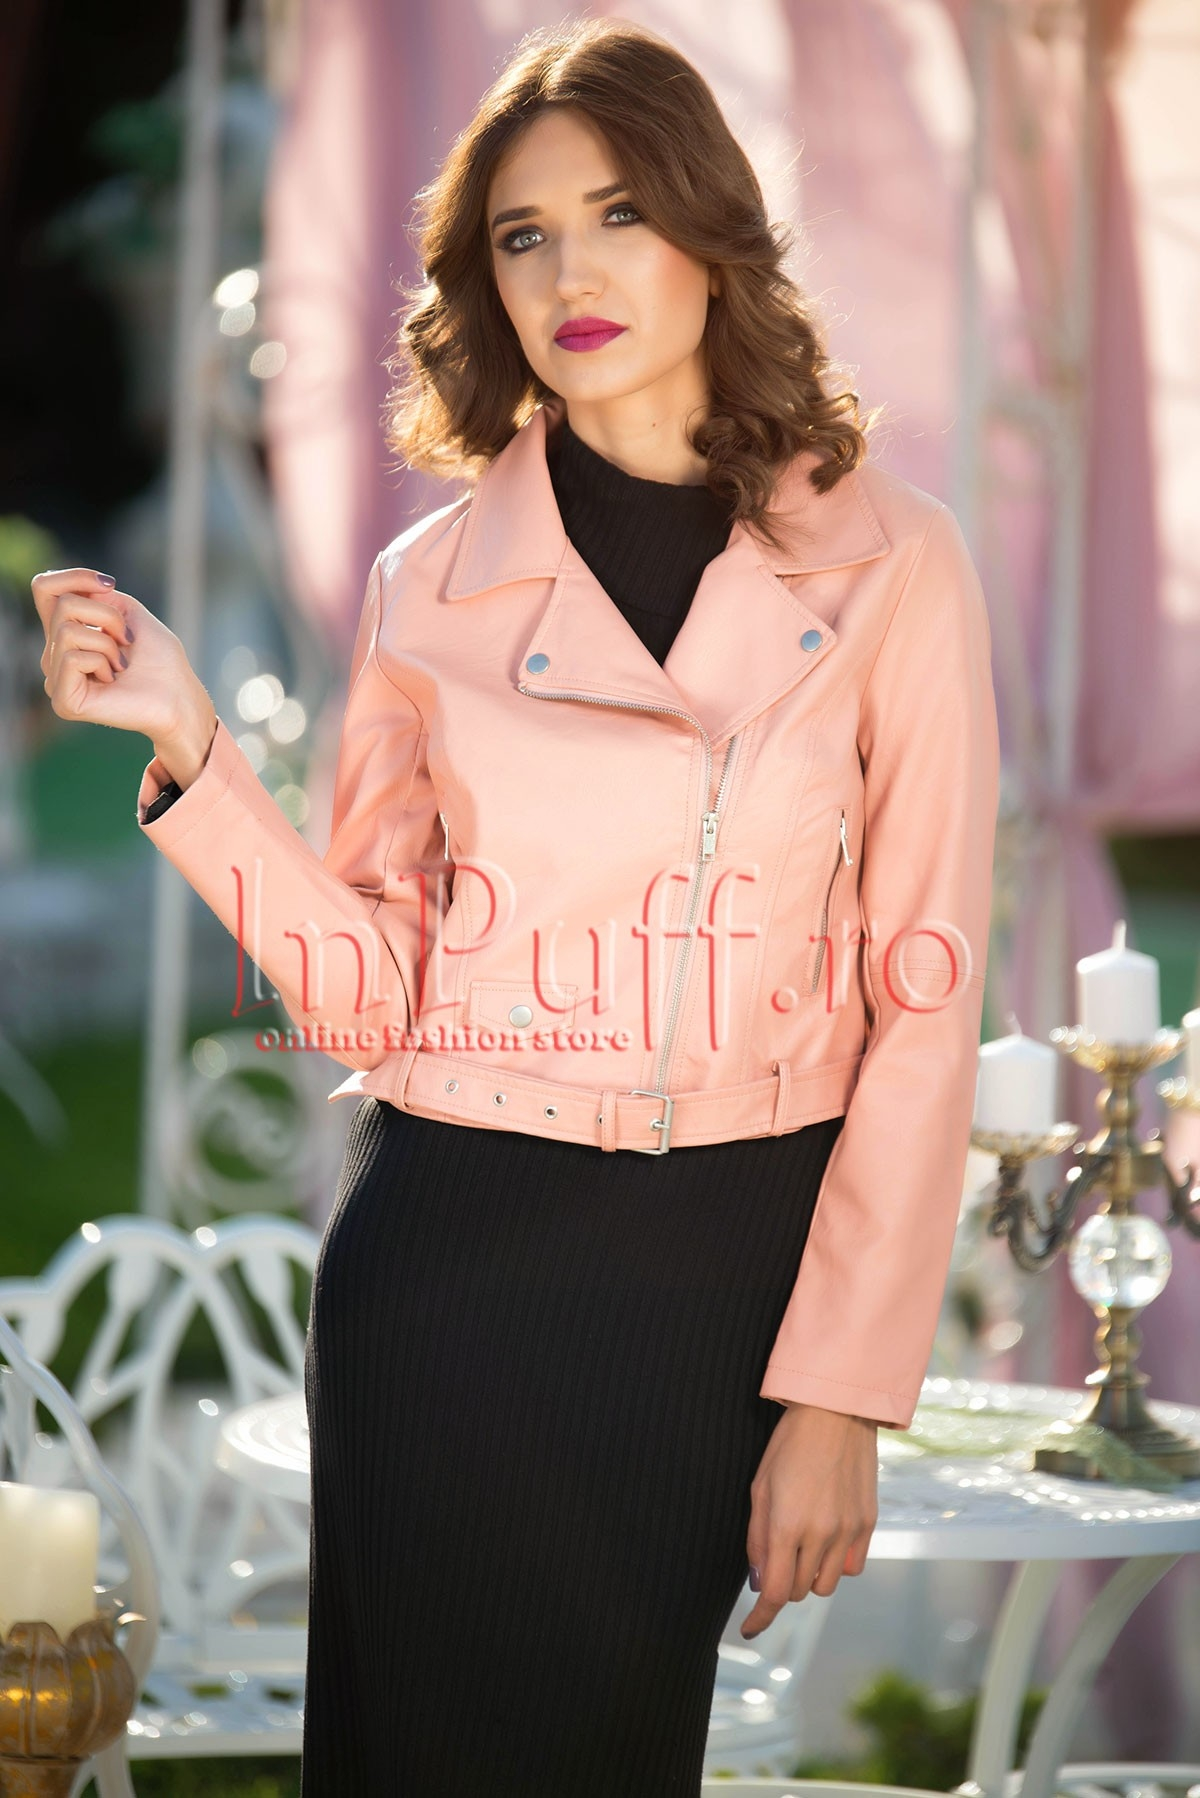 Jacheta scurta din piele ecologica roz pudra thumbnail